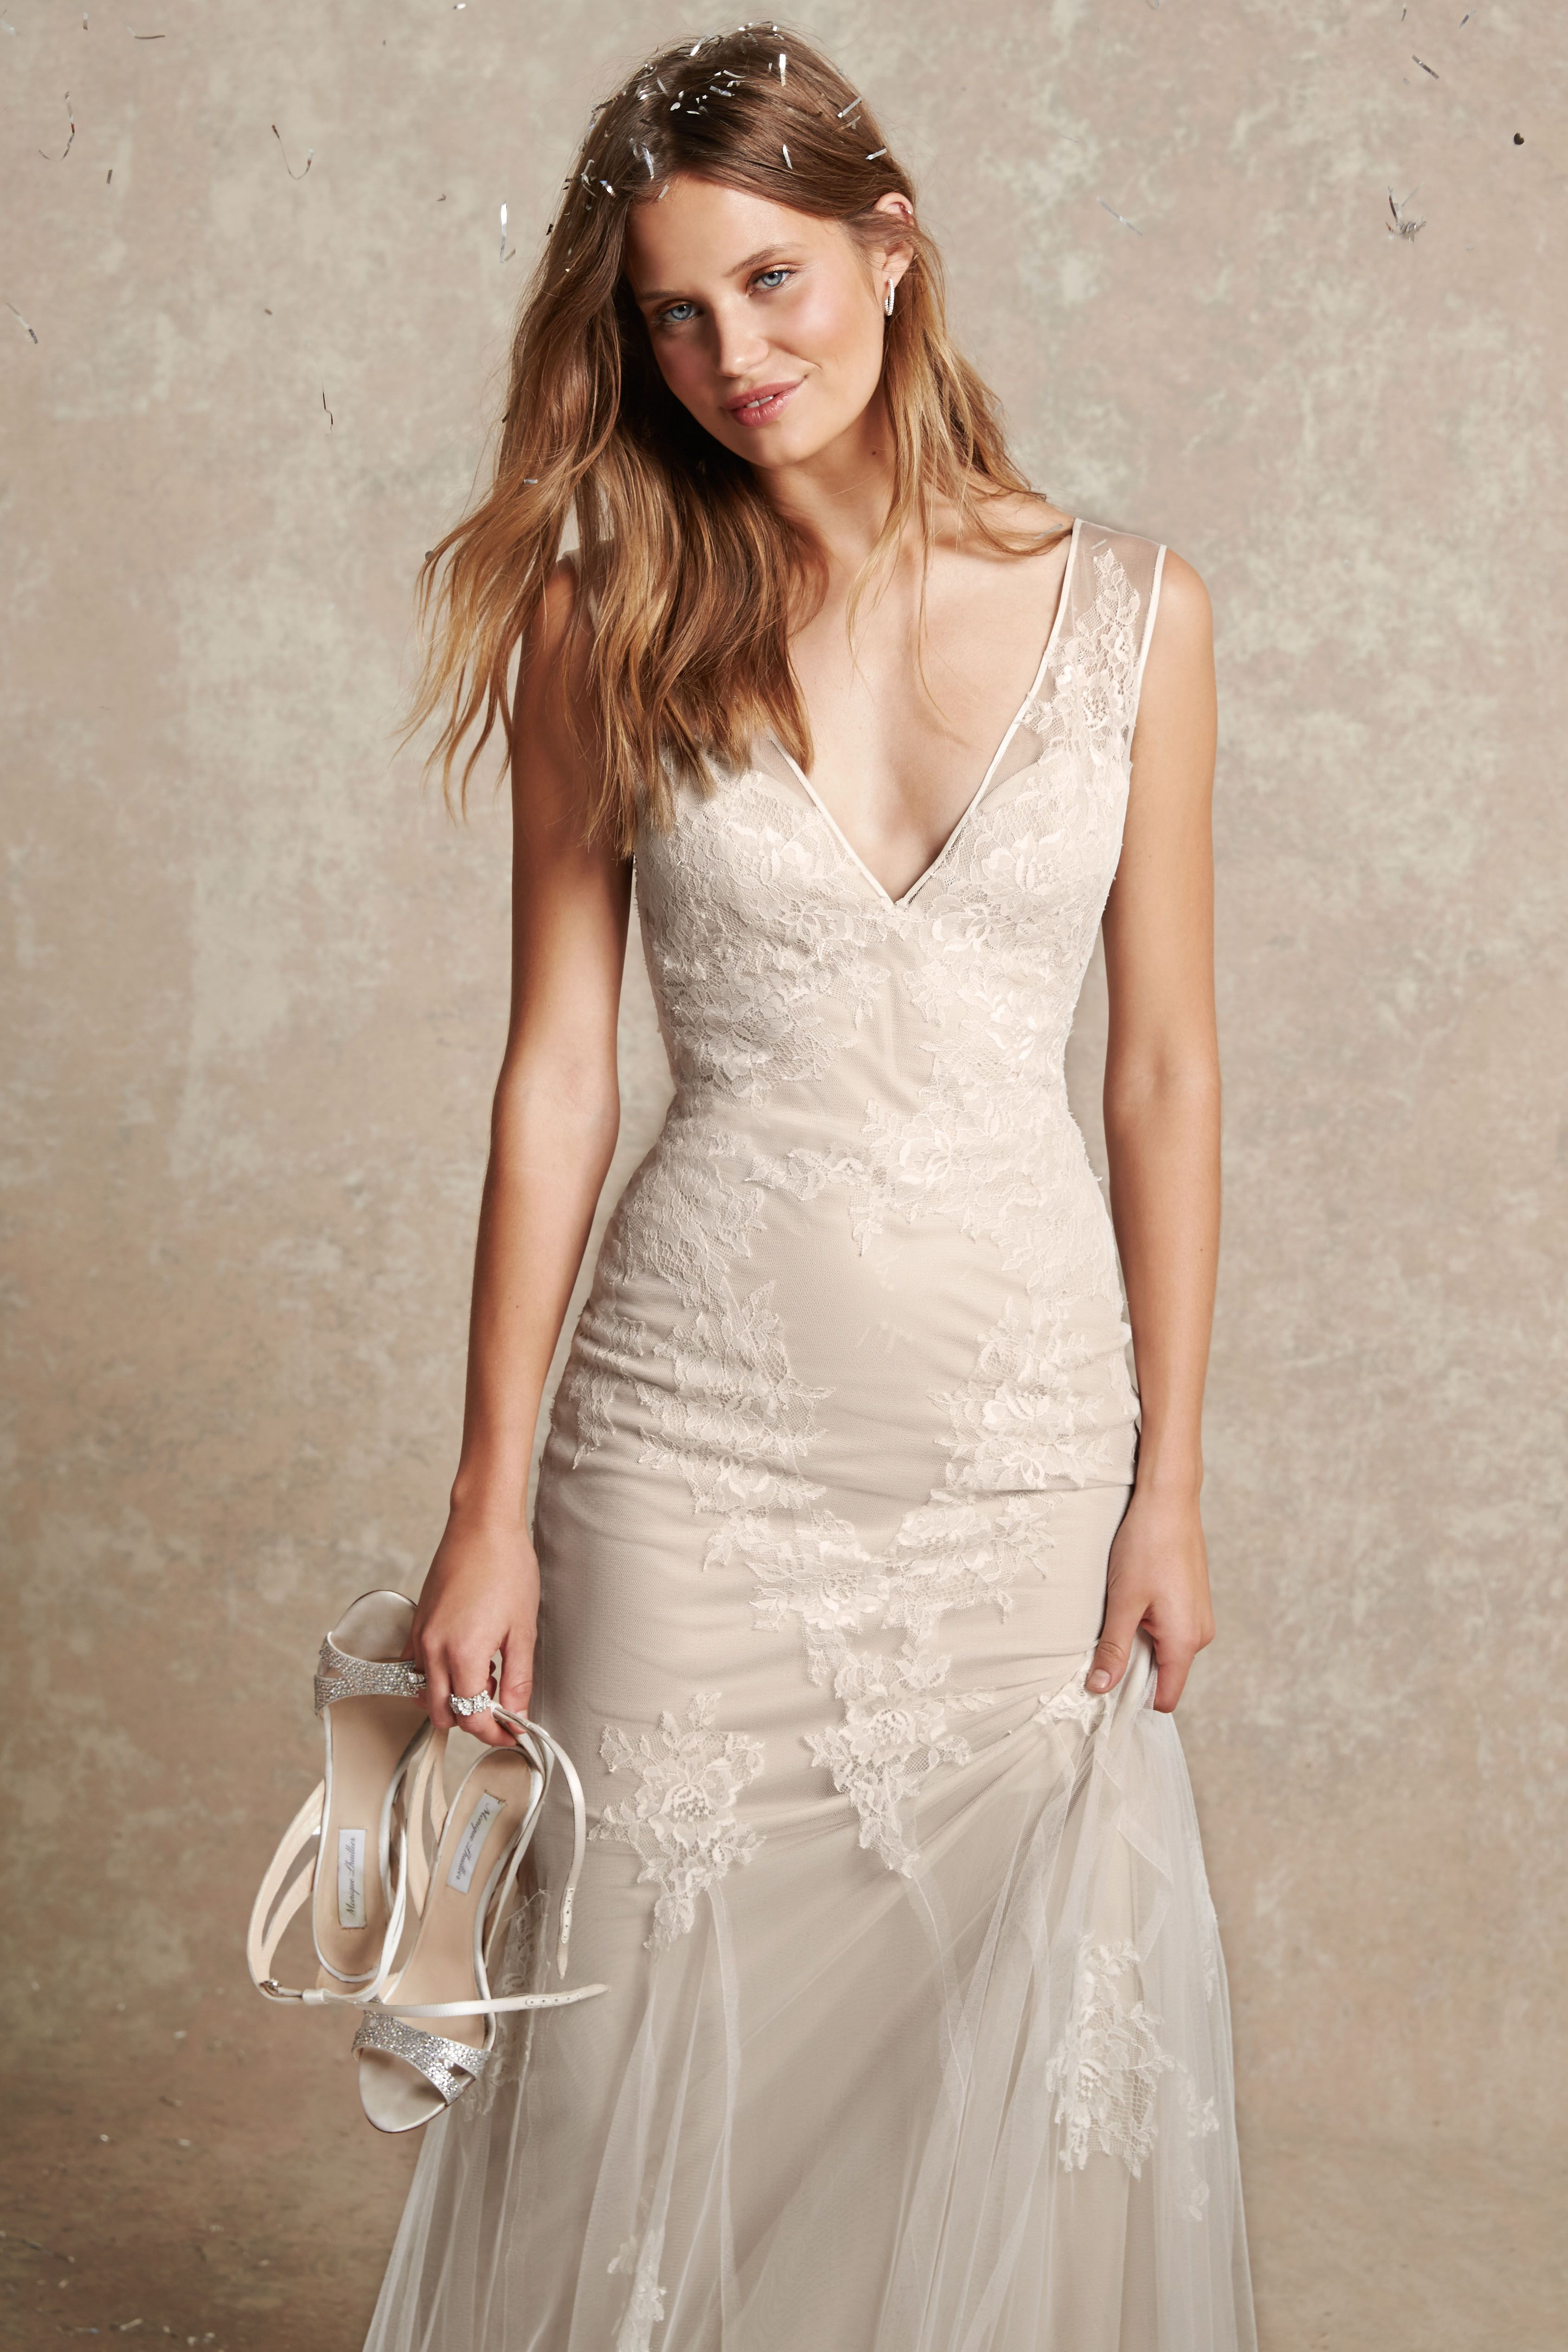 Bliss Monique Lhuillier Spring 2015 | Hippie wed dresses | Pinterest ...